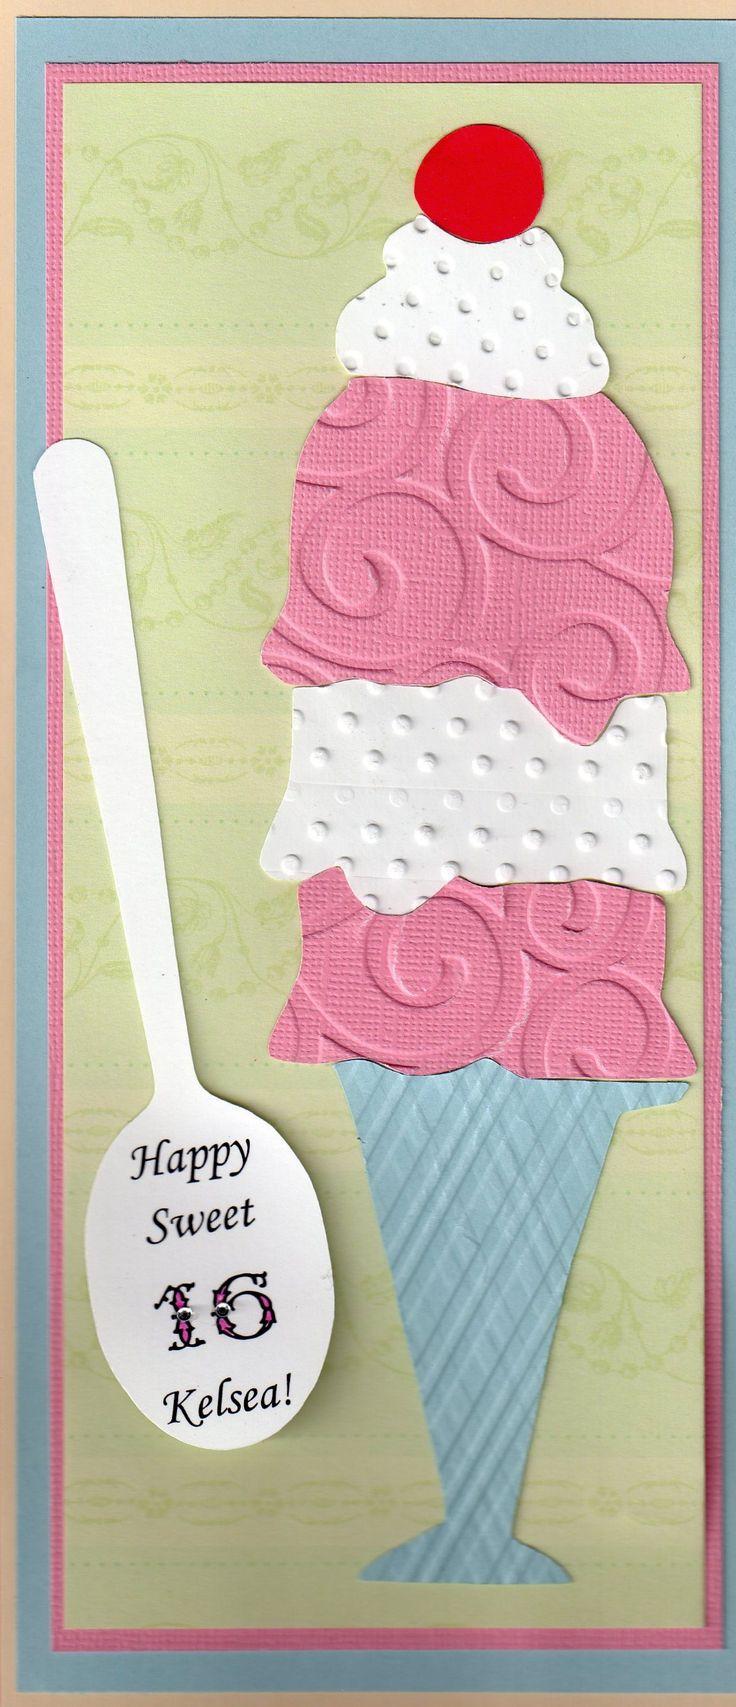 Best 53 Girls Birthday Cards Images On Pinterest Birthdays Bday